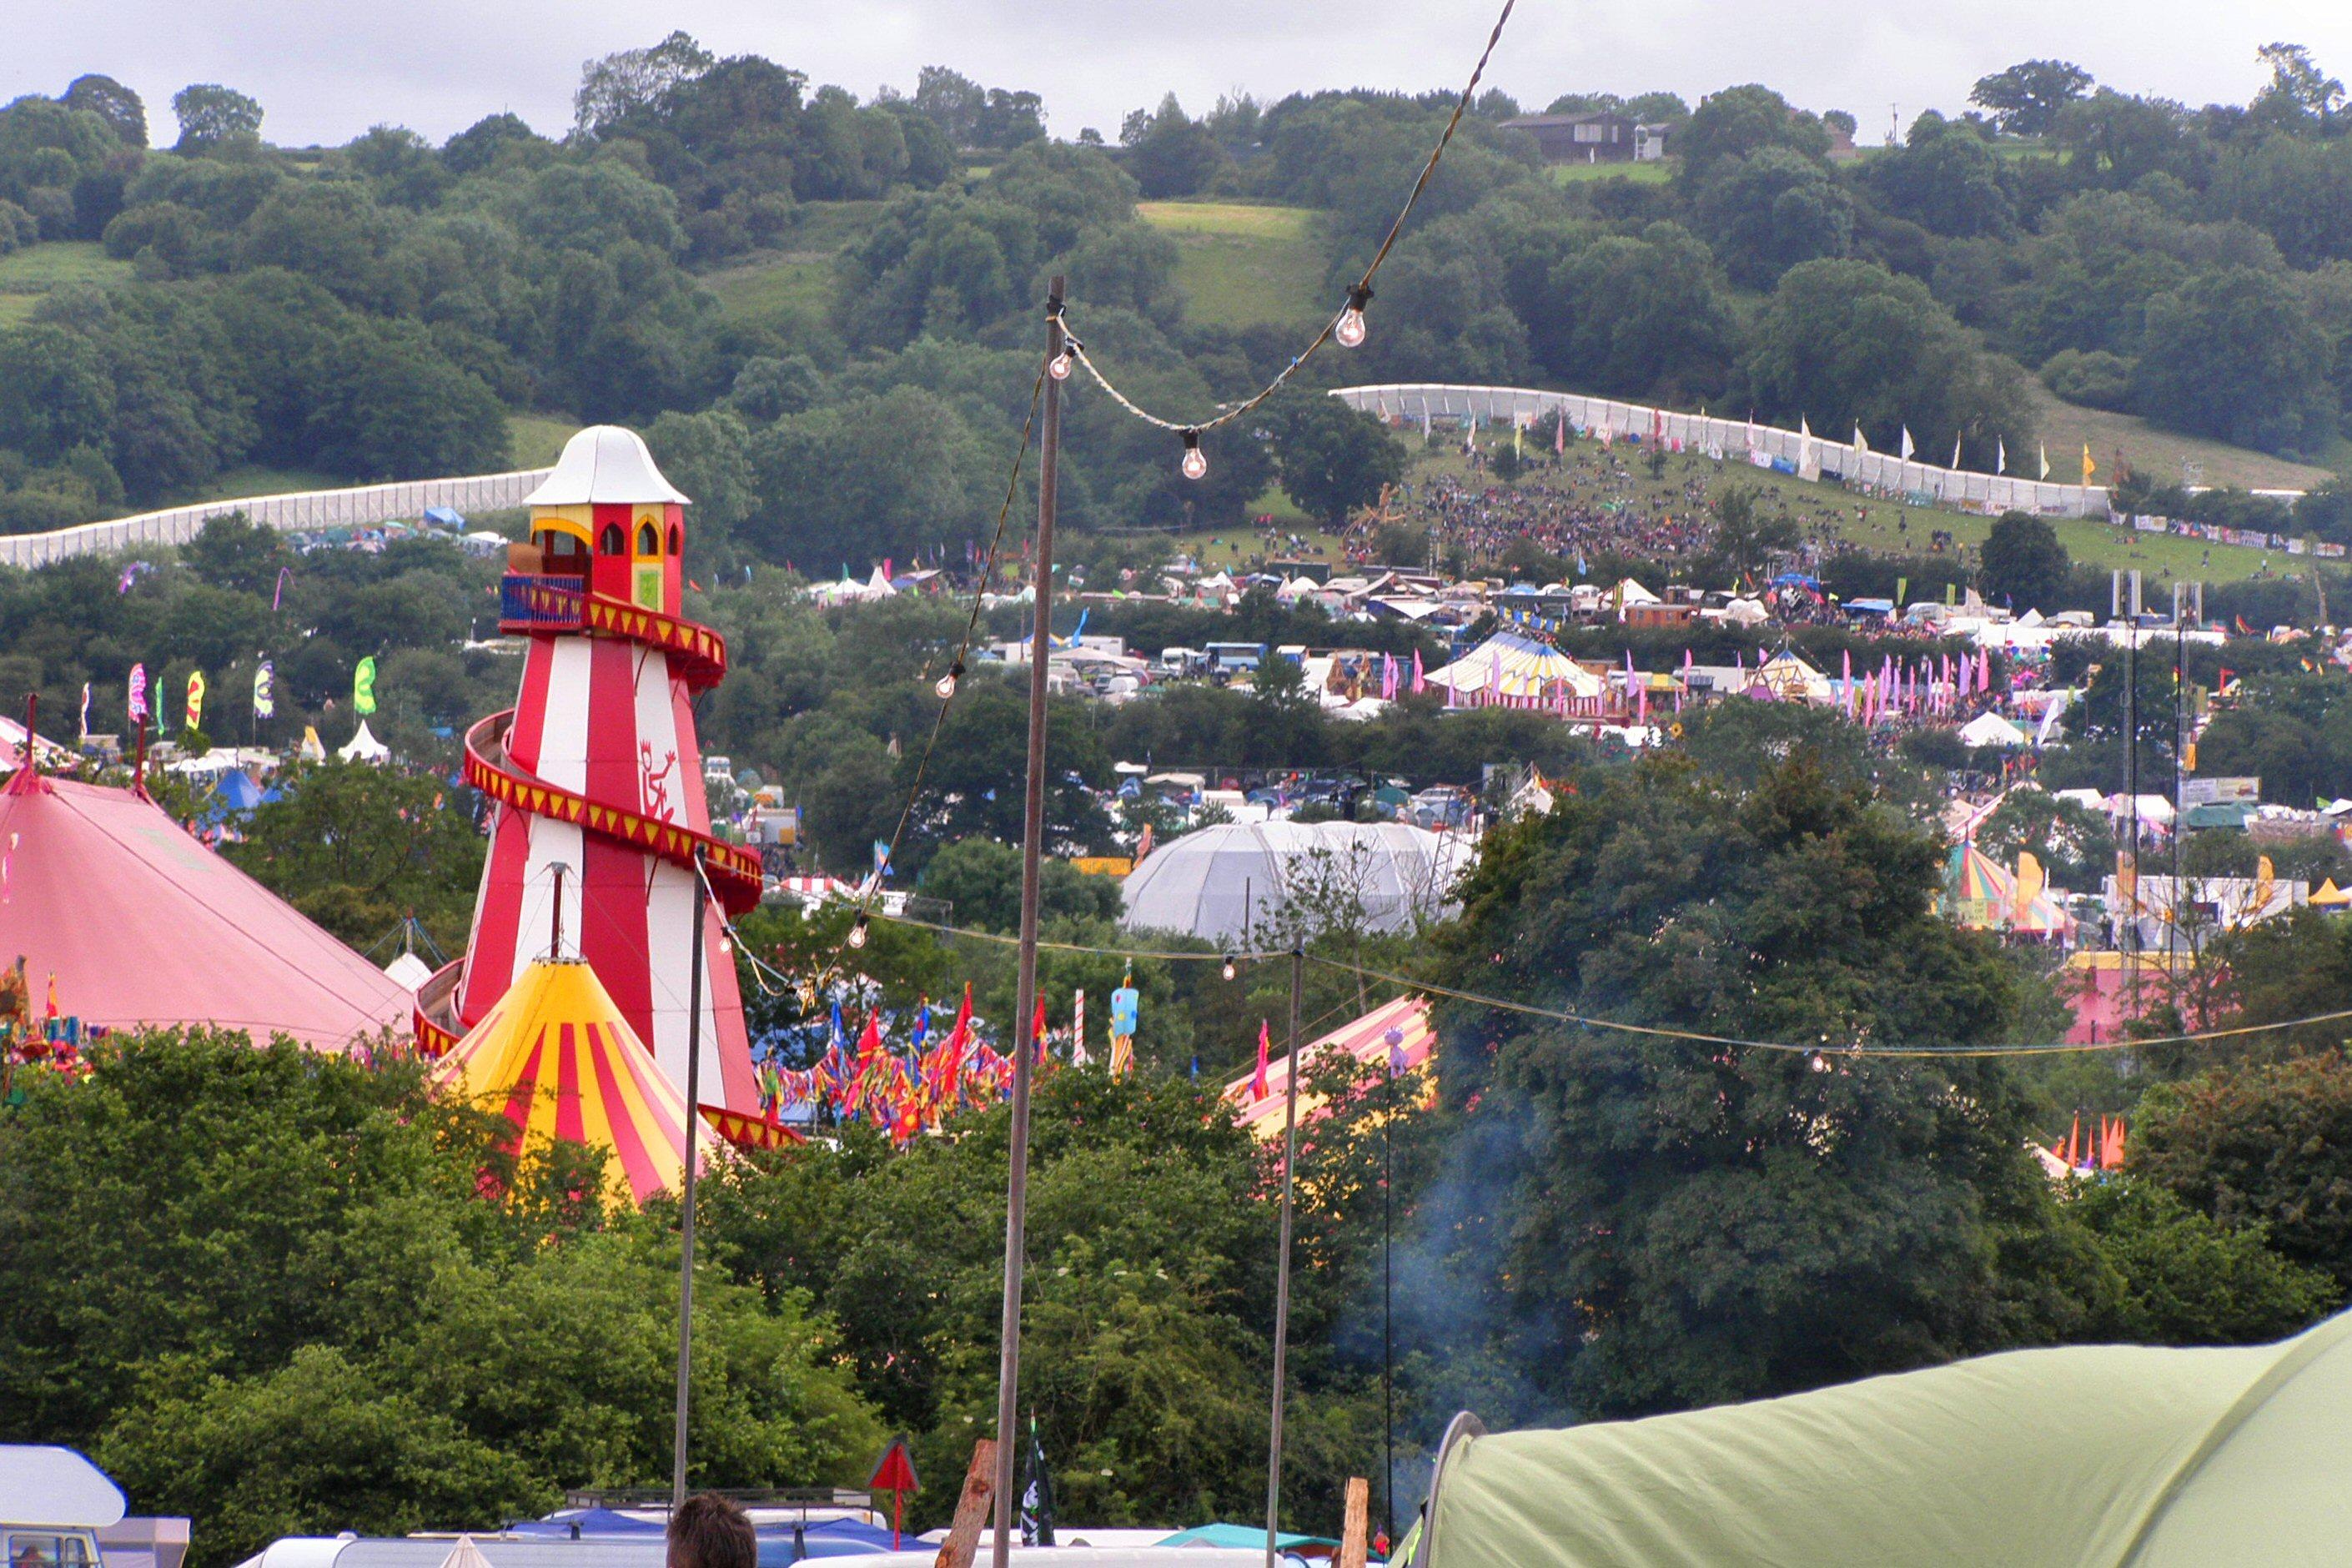 Biffy Clyro: Saviours of the UK festival